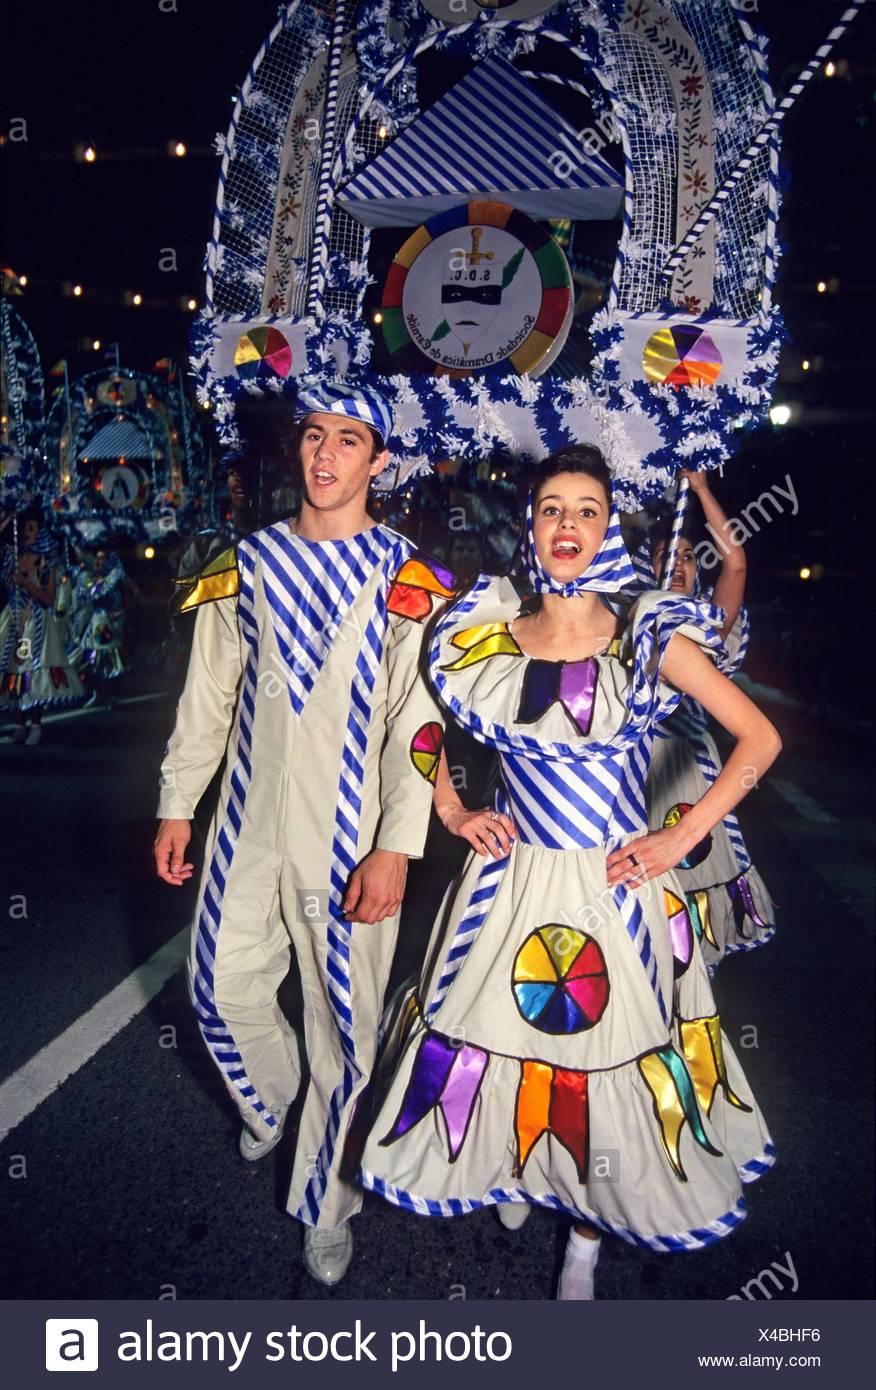 parade during Santo Antonio festivities, Lisbon, Portugal, Southern Europe. - Stock Image